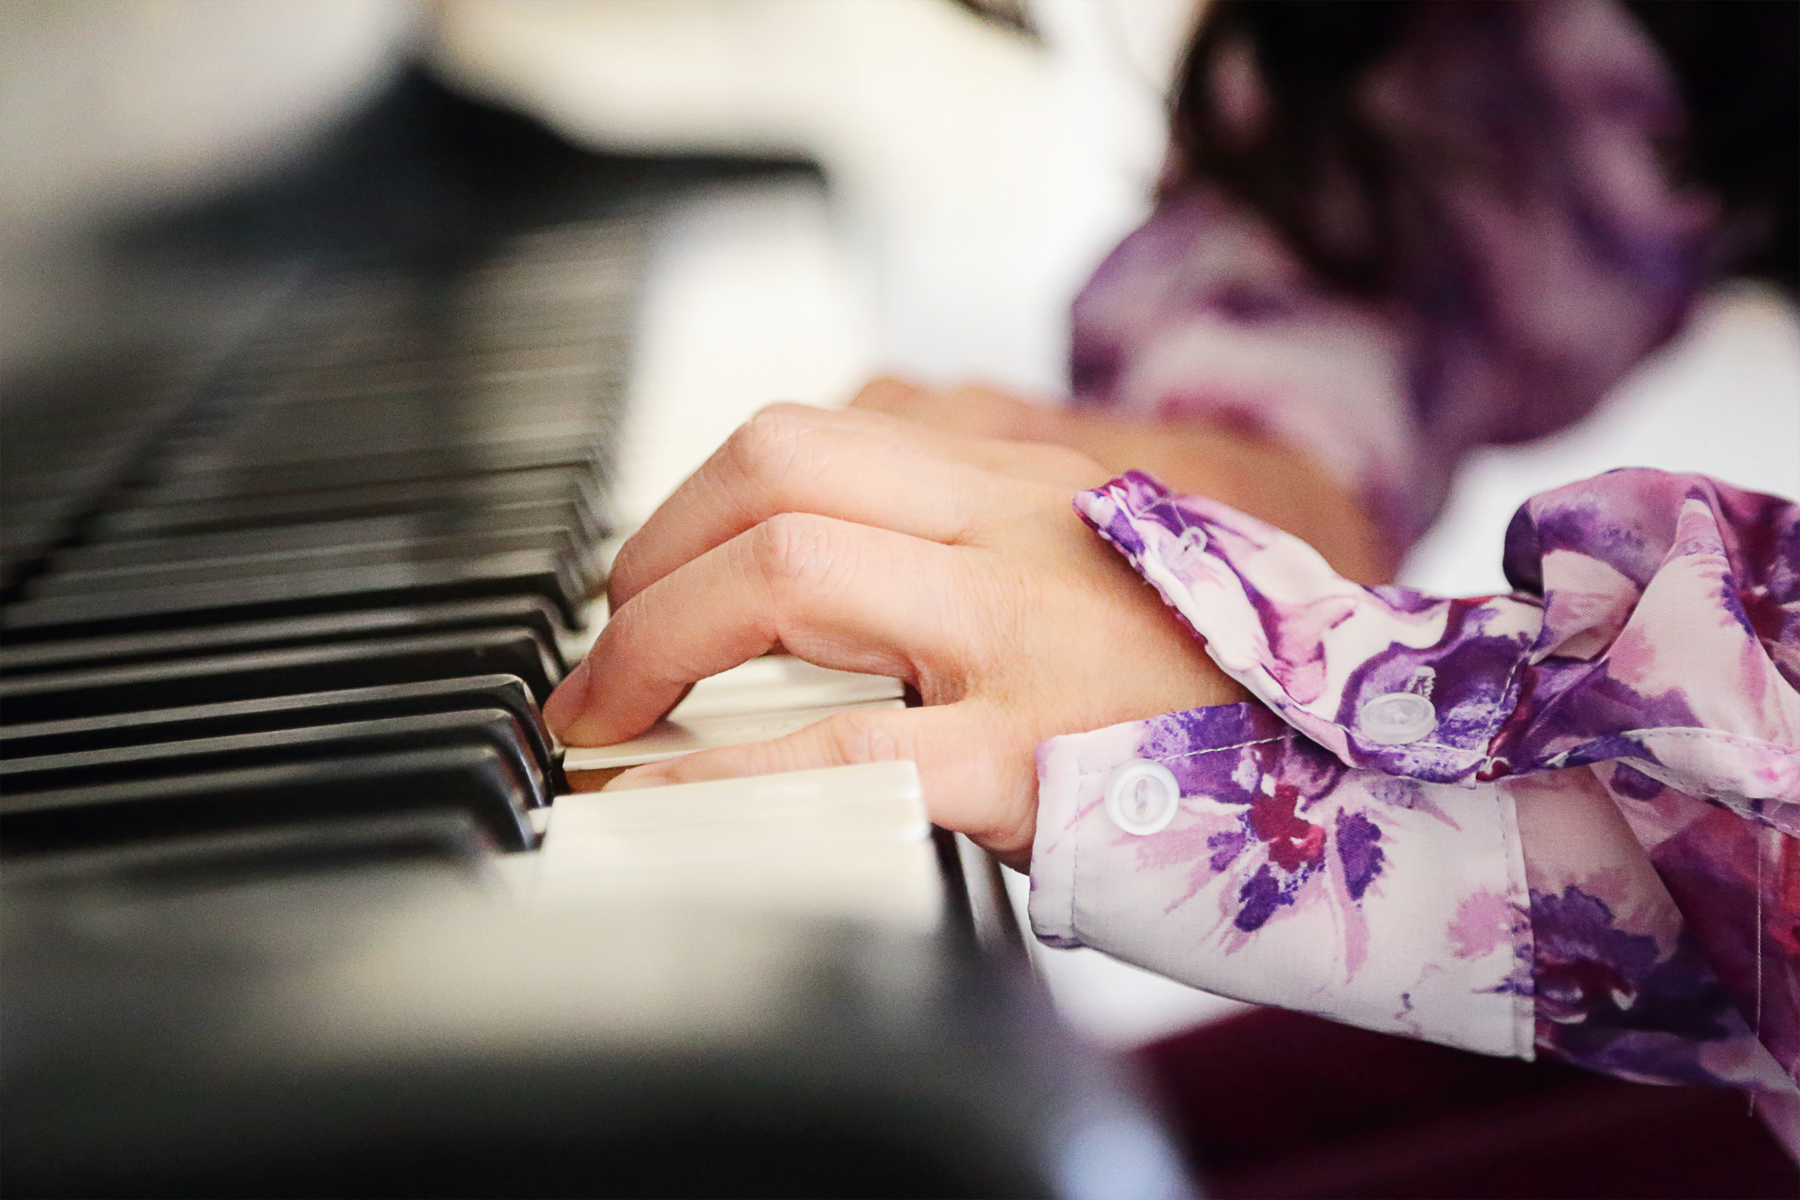 Piano_Play_A_5_DPP_0015.png